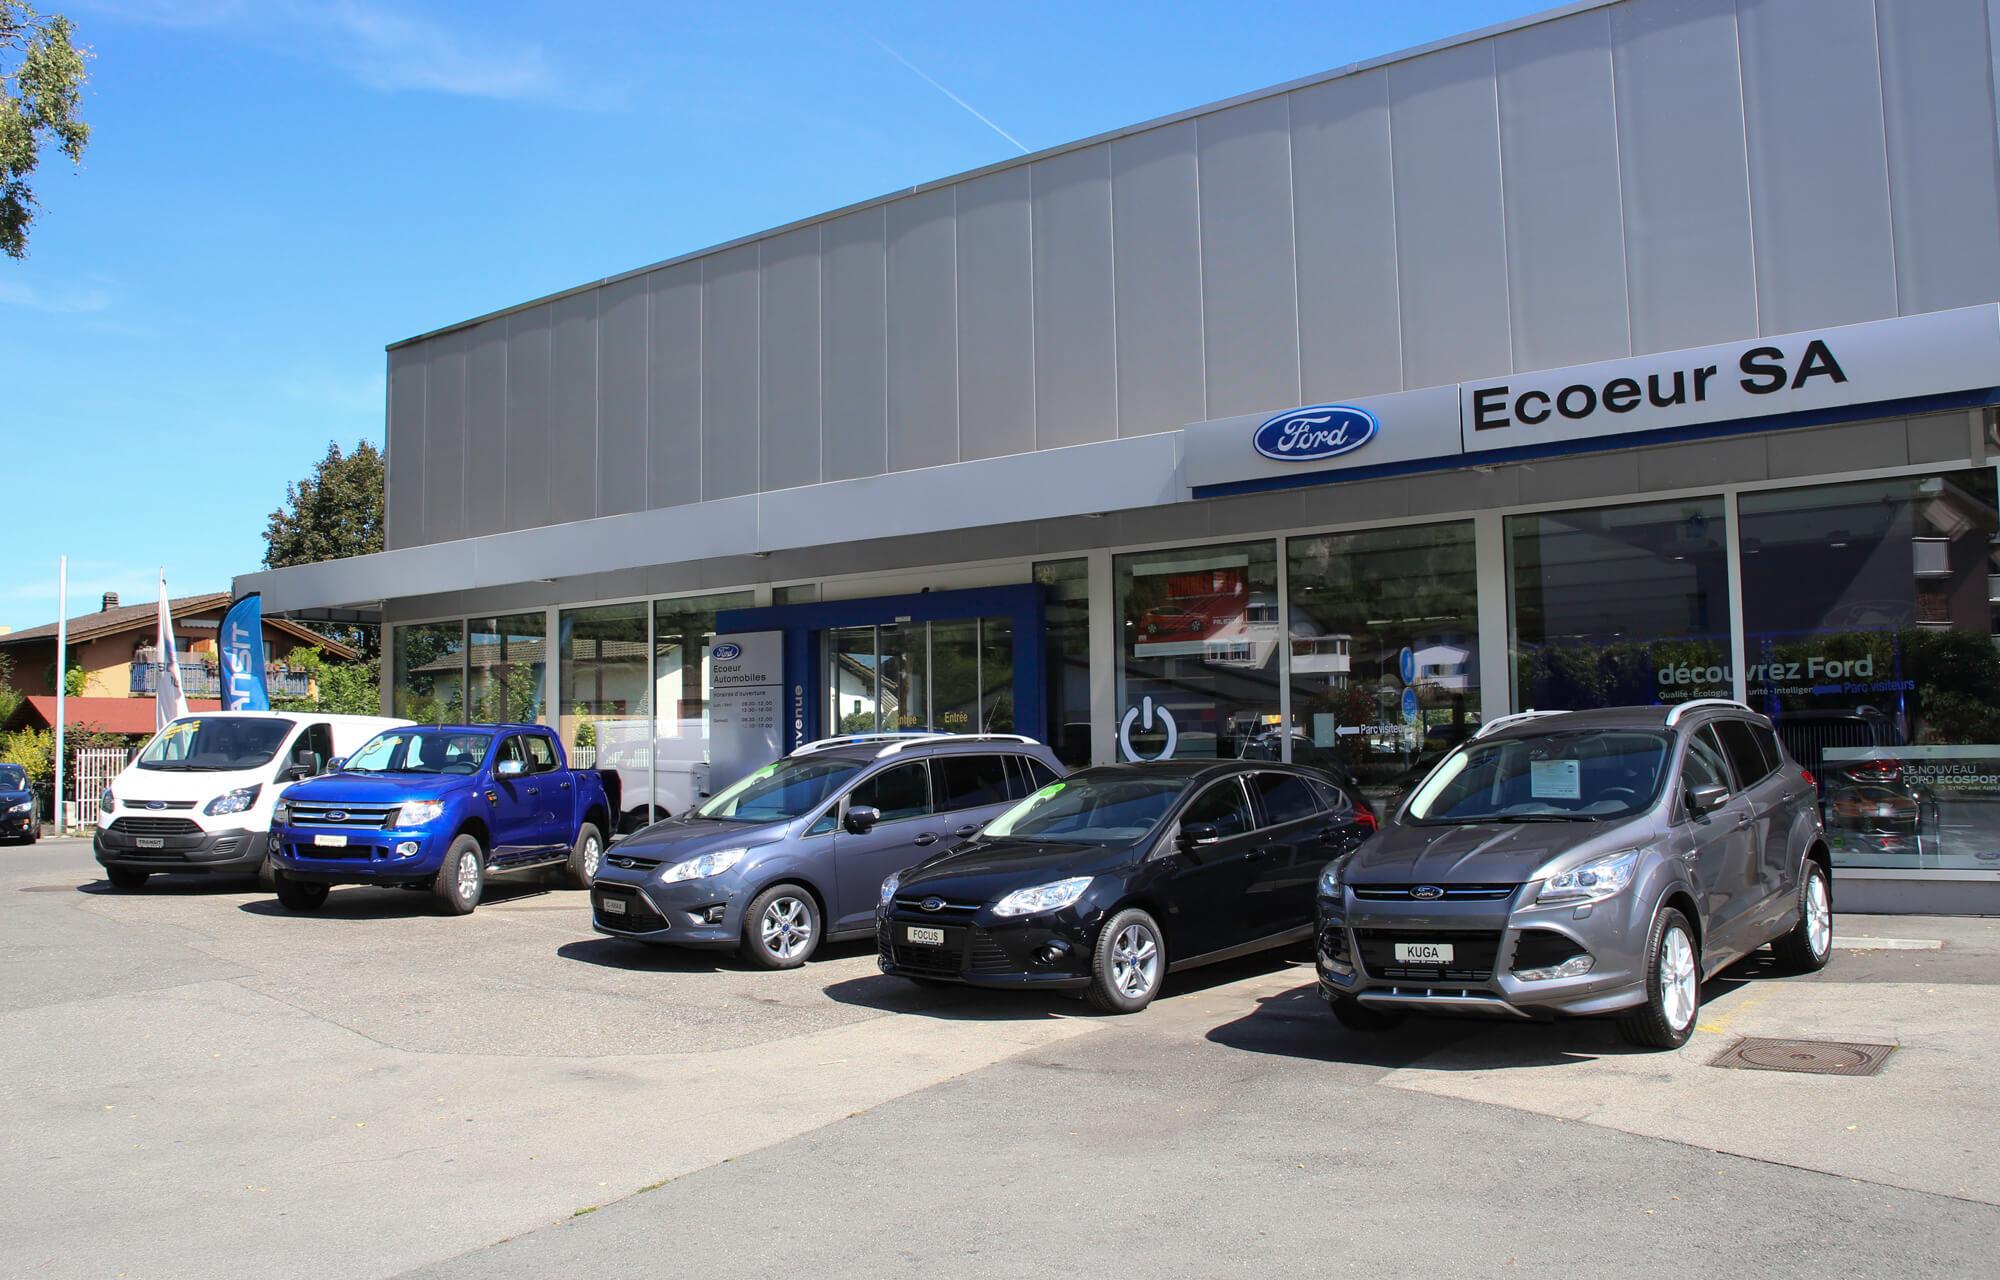 Ford Ecoeur Automobile-Garage Collombey Valais